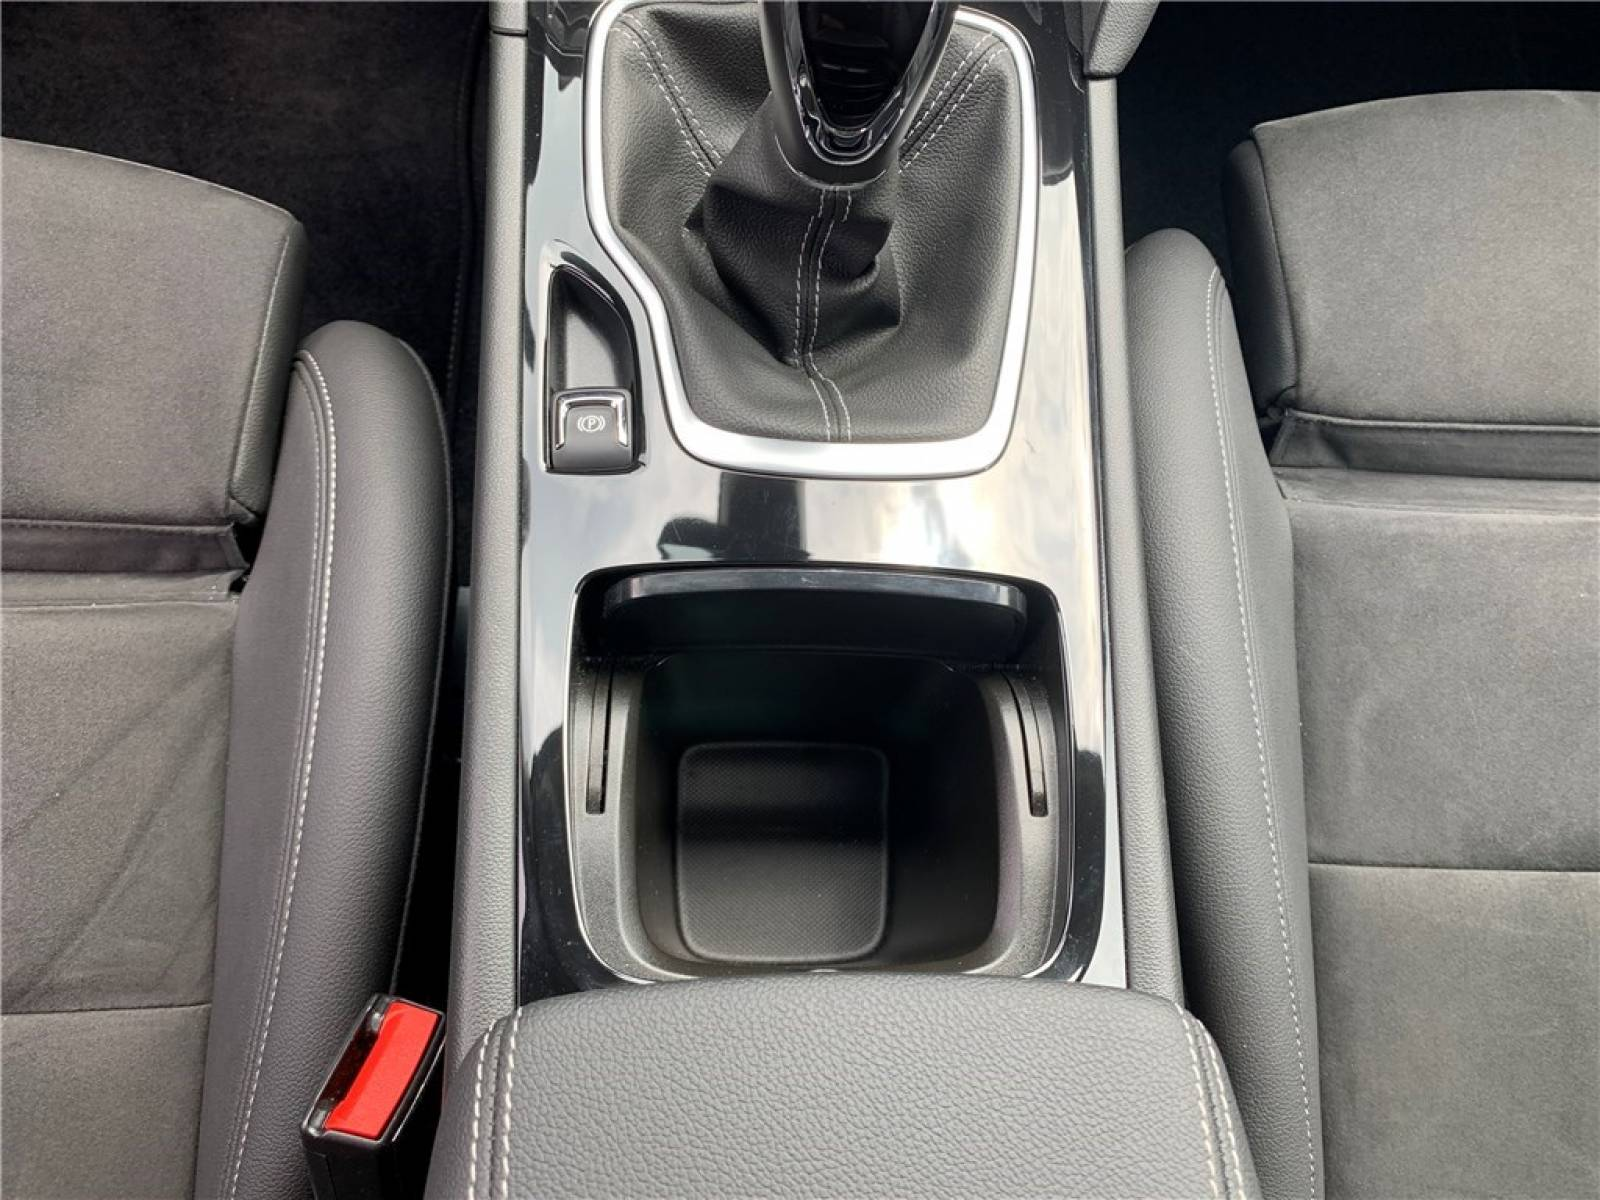 OPEL Insignia Grand Sport 1.6 Diesel 136 ch - véhicule d'occasion - Groupe Guillet - Opel Magicauto - Montceau-les-Mines - 71300 - Montceau-les-Mines - 25